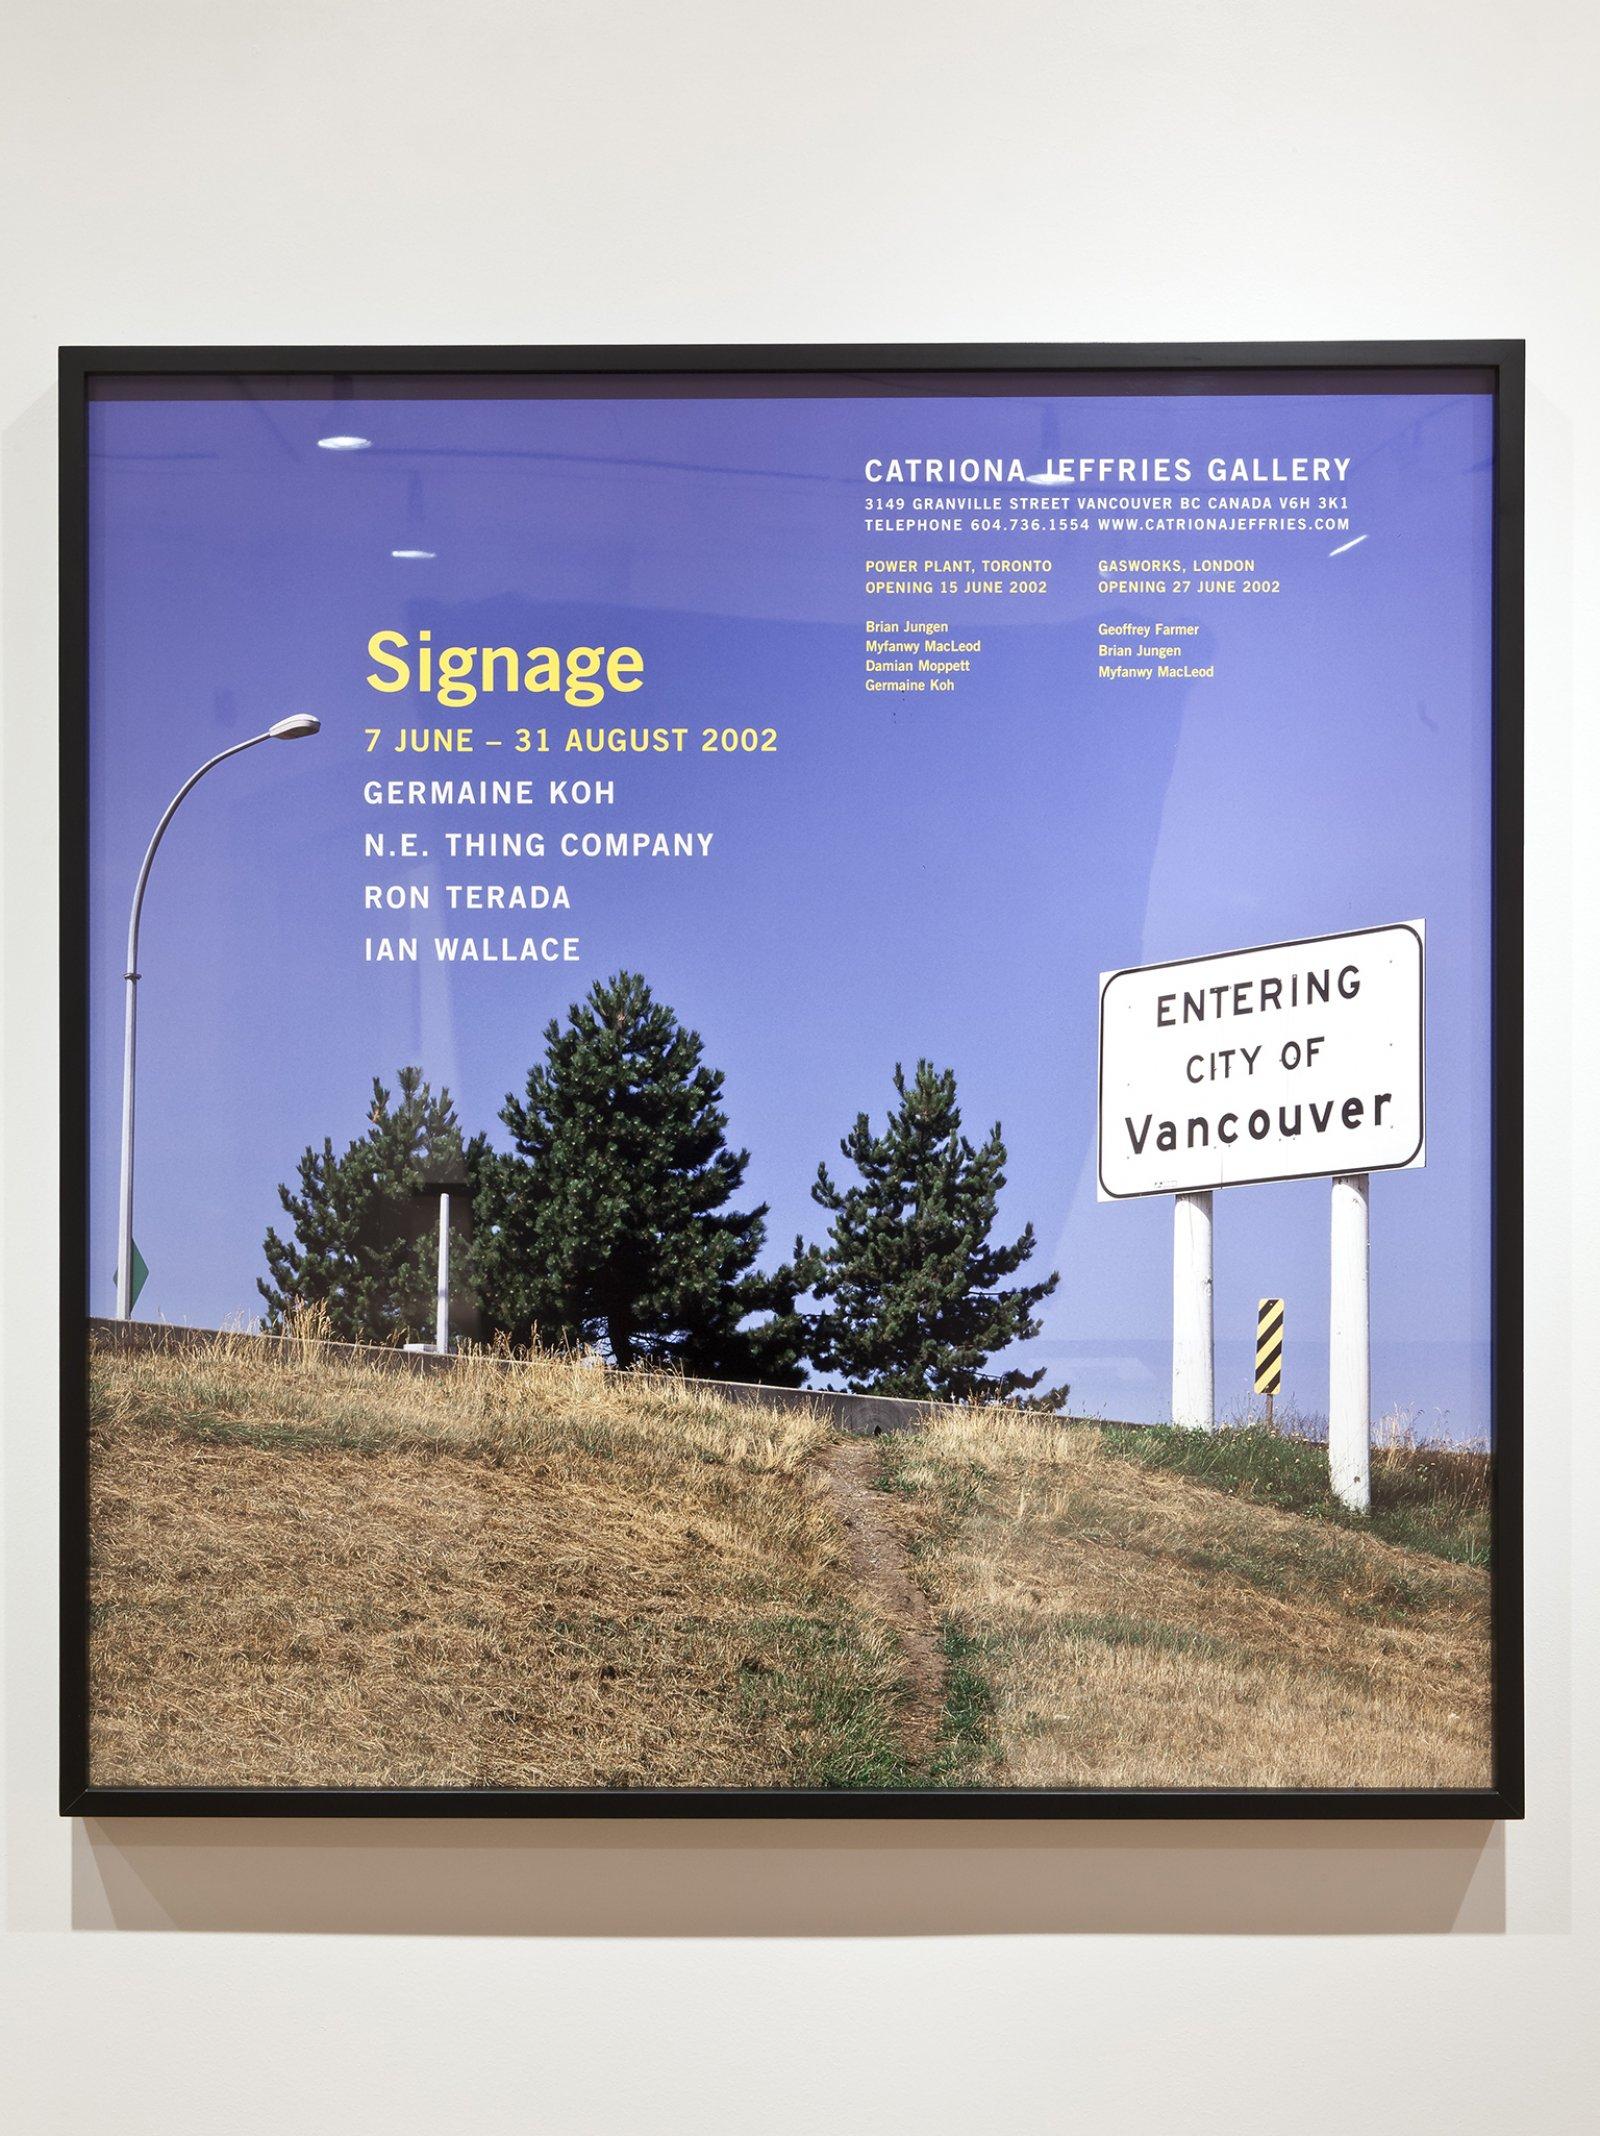 RonTerada,Signage, 2002, colour lightjet photograph,43 x 43 in.(109 x 109 cm)